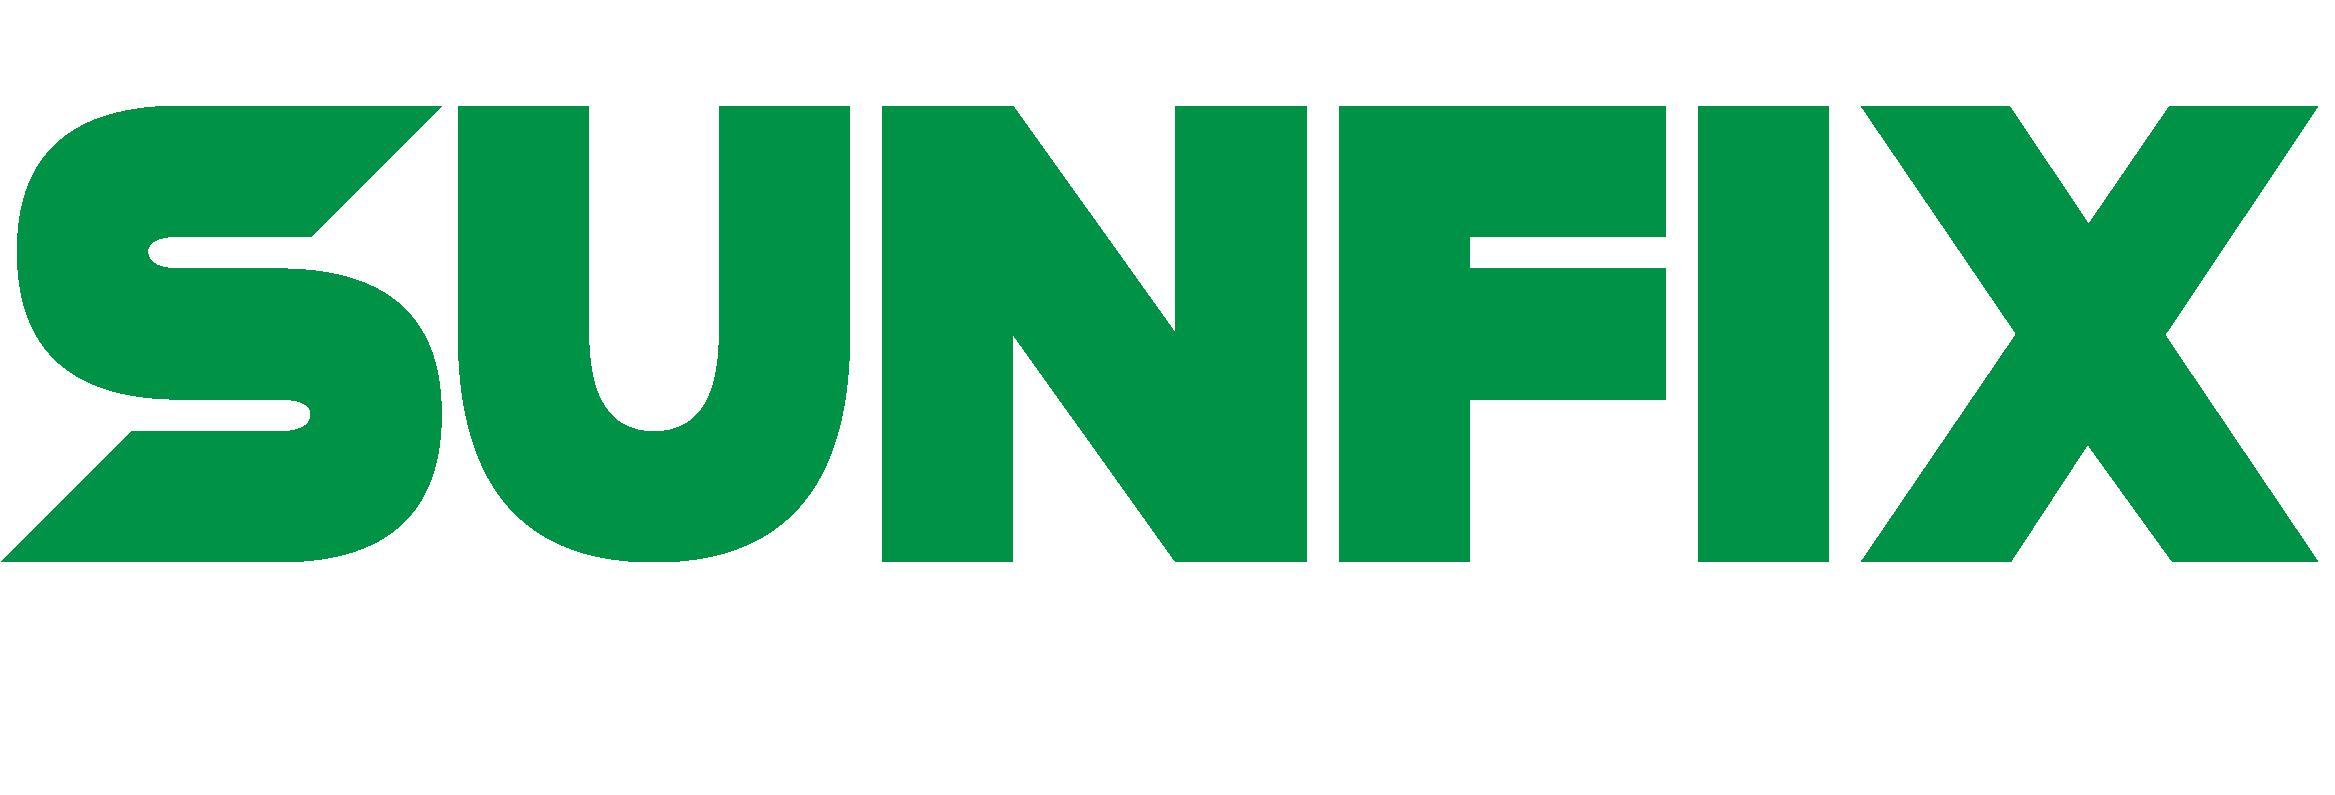 https://secureservercdn.net/198.71.233.185/sz0.269.myftpupload.com/wp-content/uploads/2020/10/SUNFIX-Consulting-W.png?time=1632348782